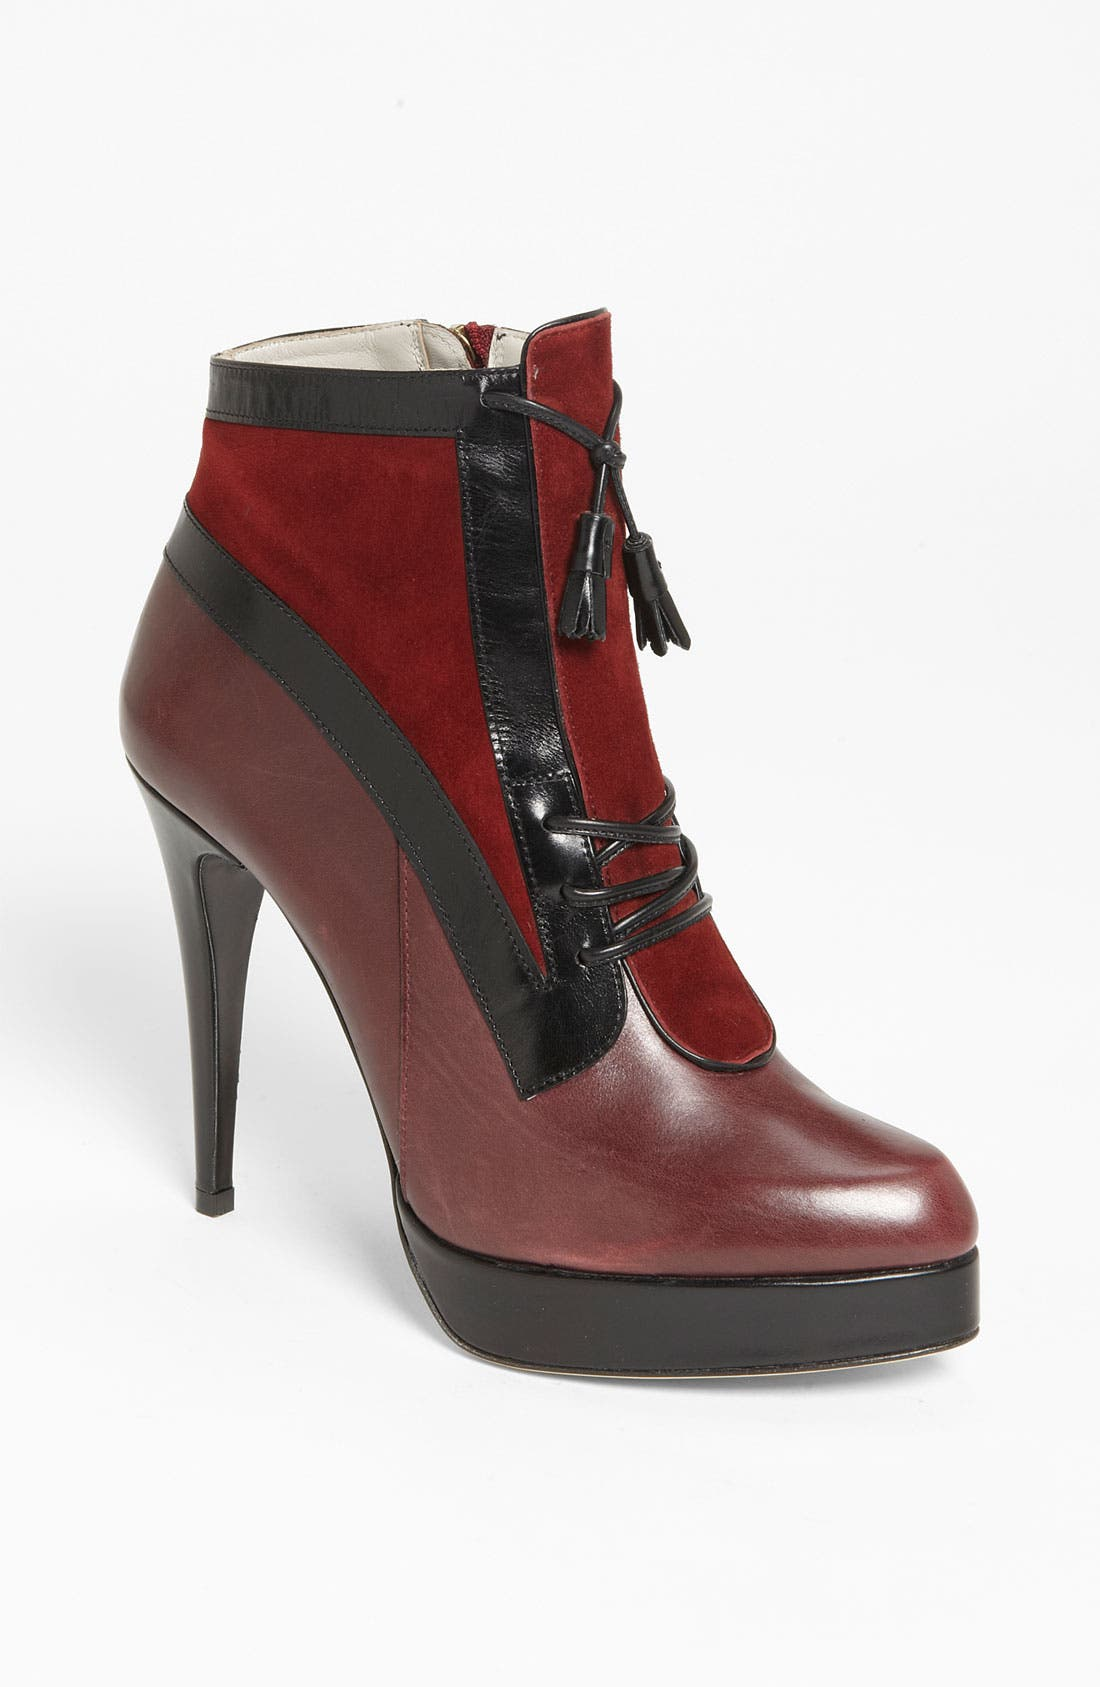 Alternate Image 1 Selected - Jason Wu Tassel Ankle Boot